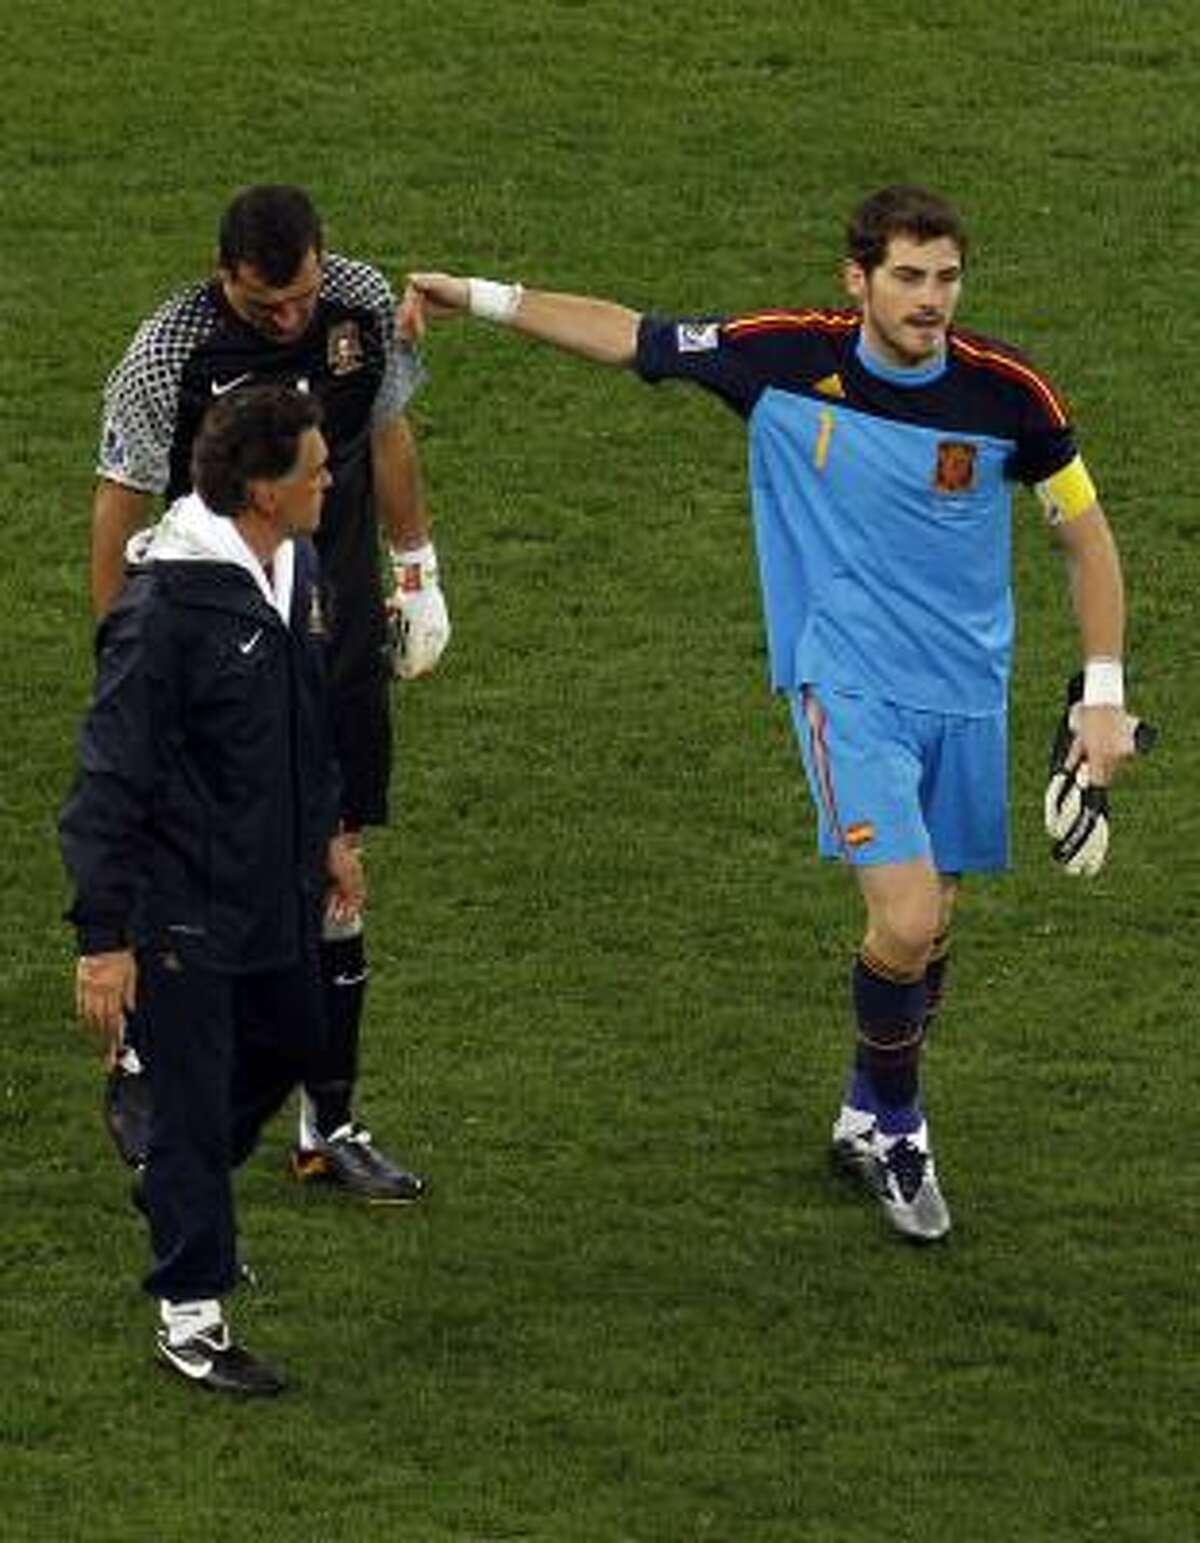 Spain goalkeeper Iker Casillas, right, consoles Portugal goalkeeper Eduardo after the match.